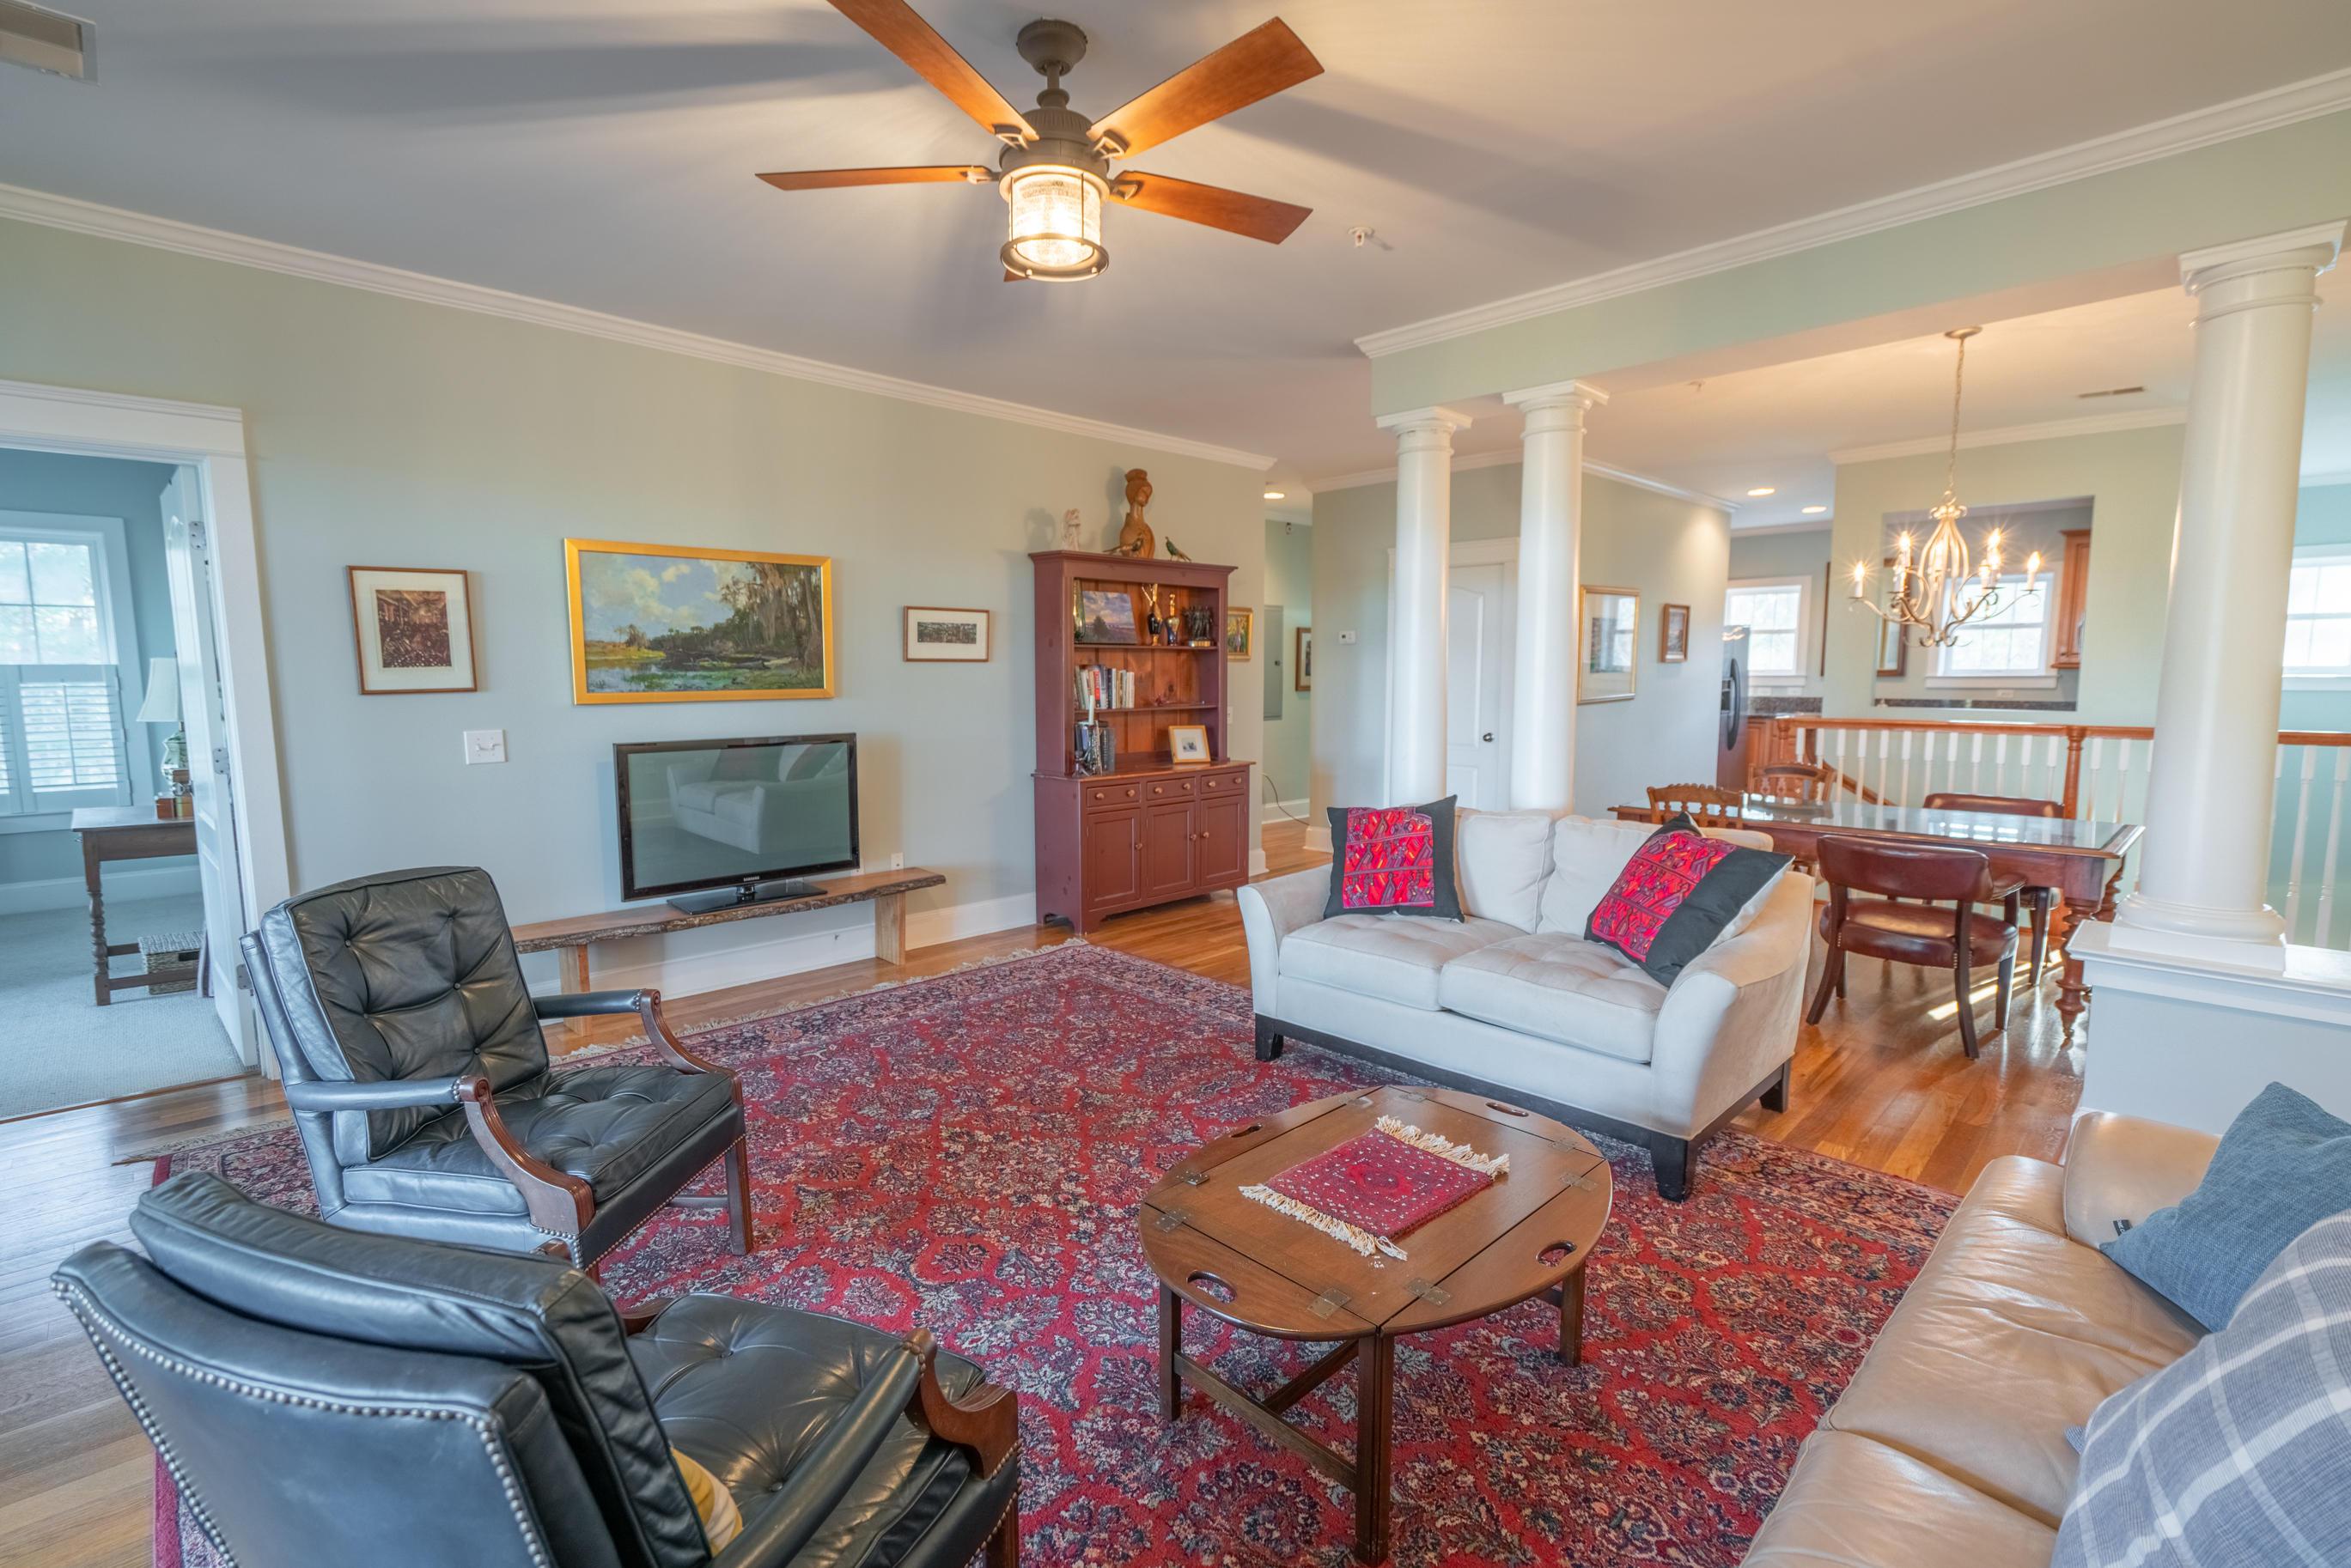 Etiwan Pointe Homes For Sale - 132 Winding Creek, Mount Pleasant, SC - 20